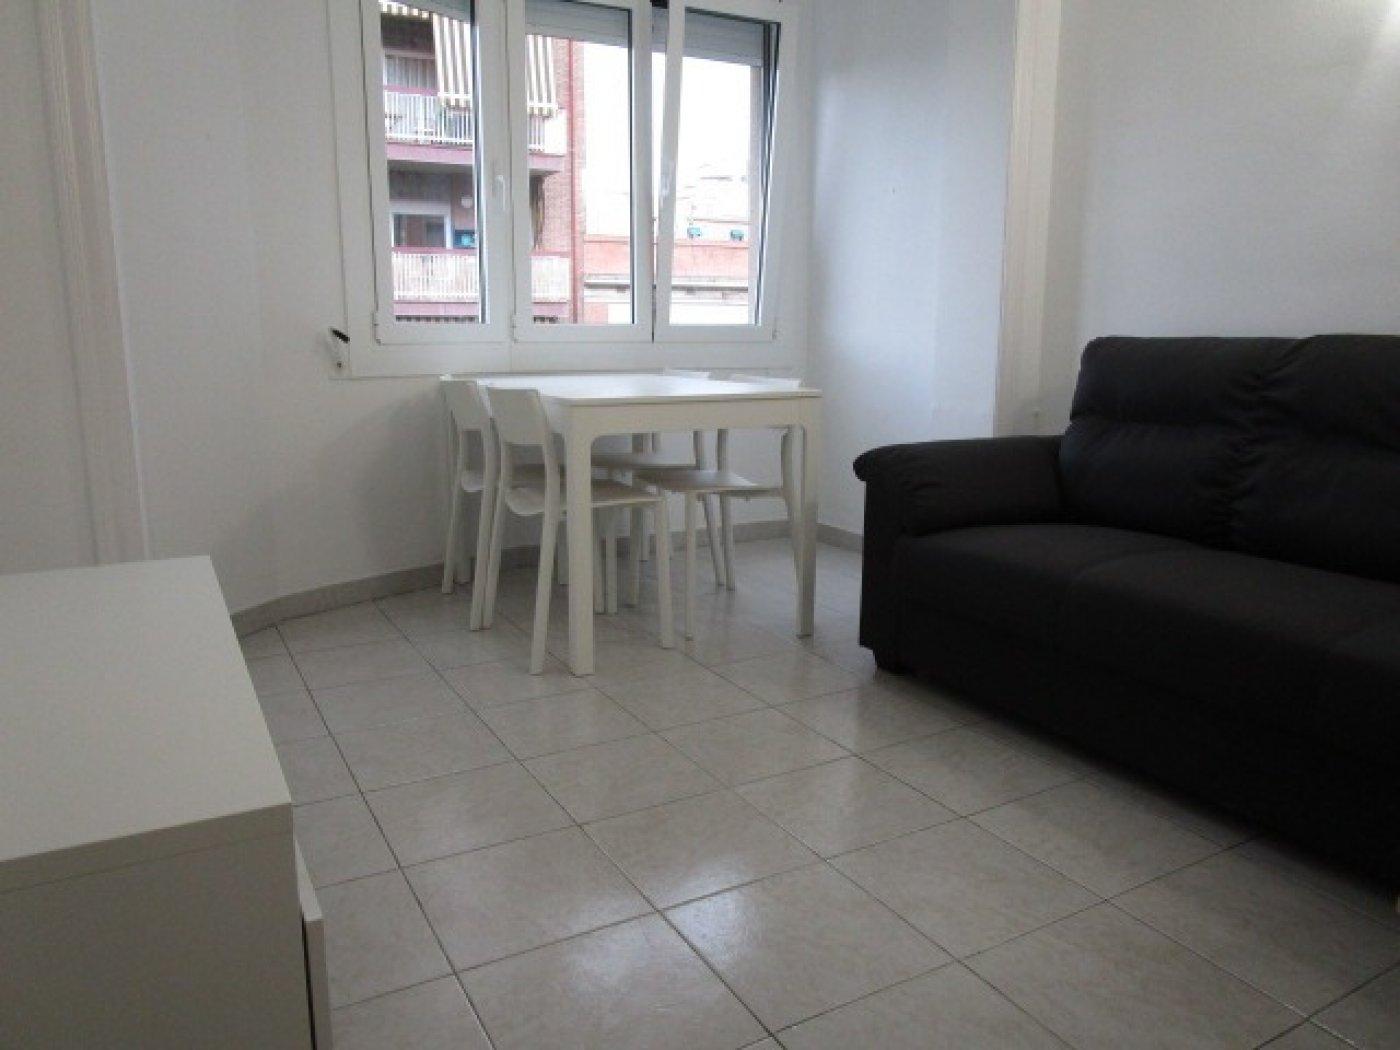 Flat for rent in Sagrada Familia, Barcelona